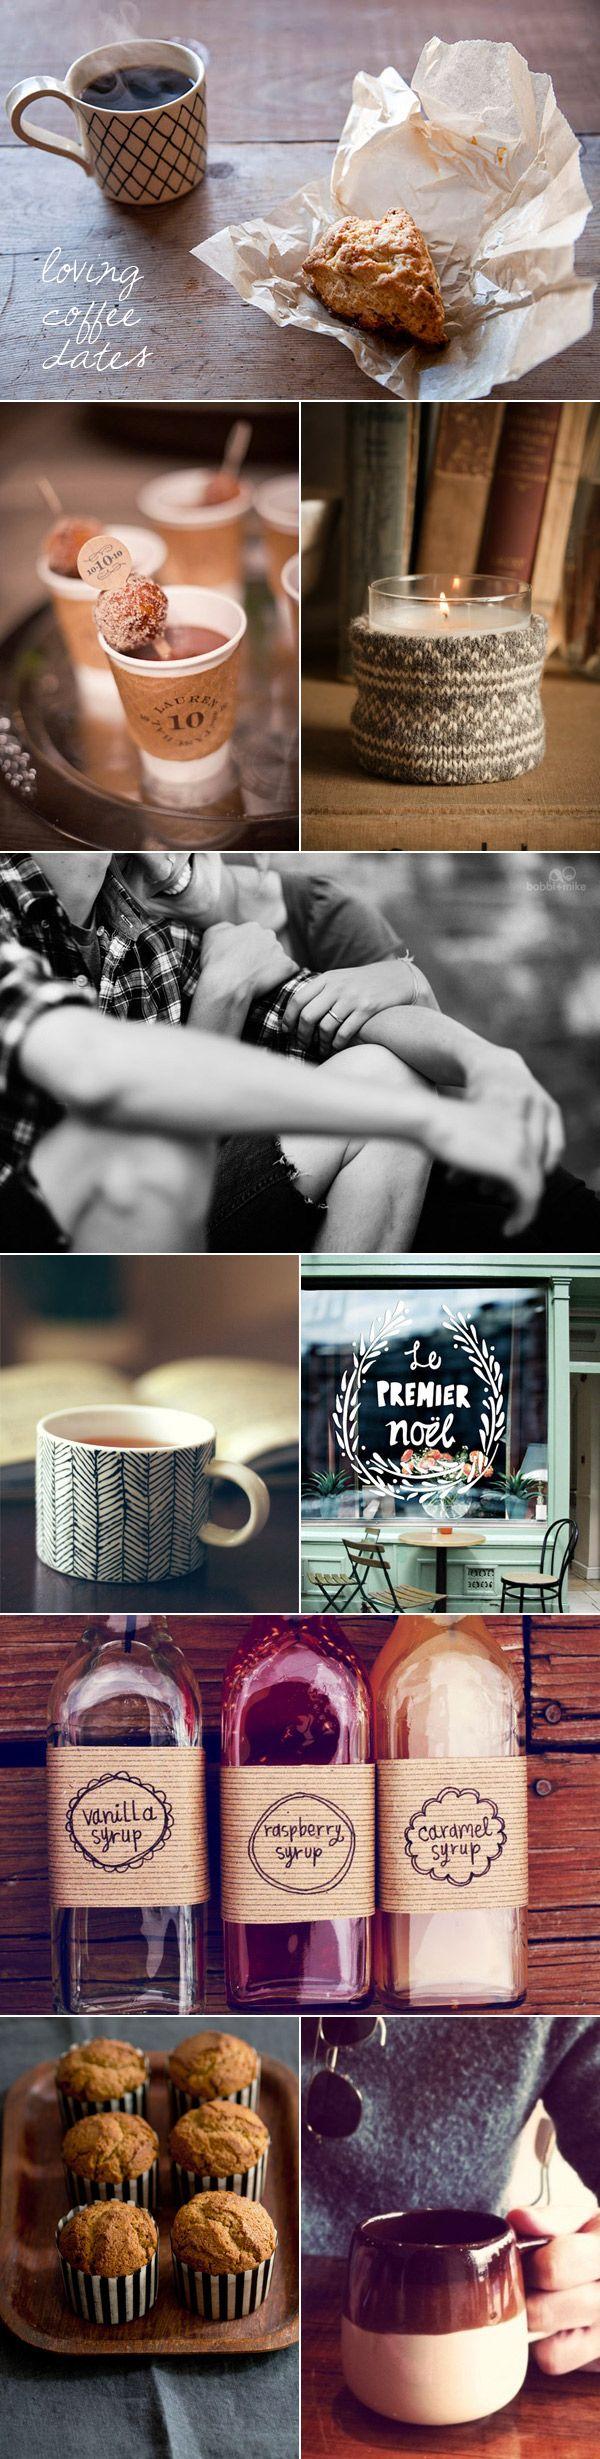 coffee dates... love